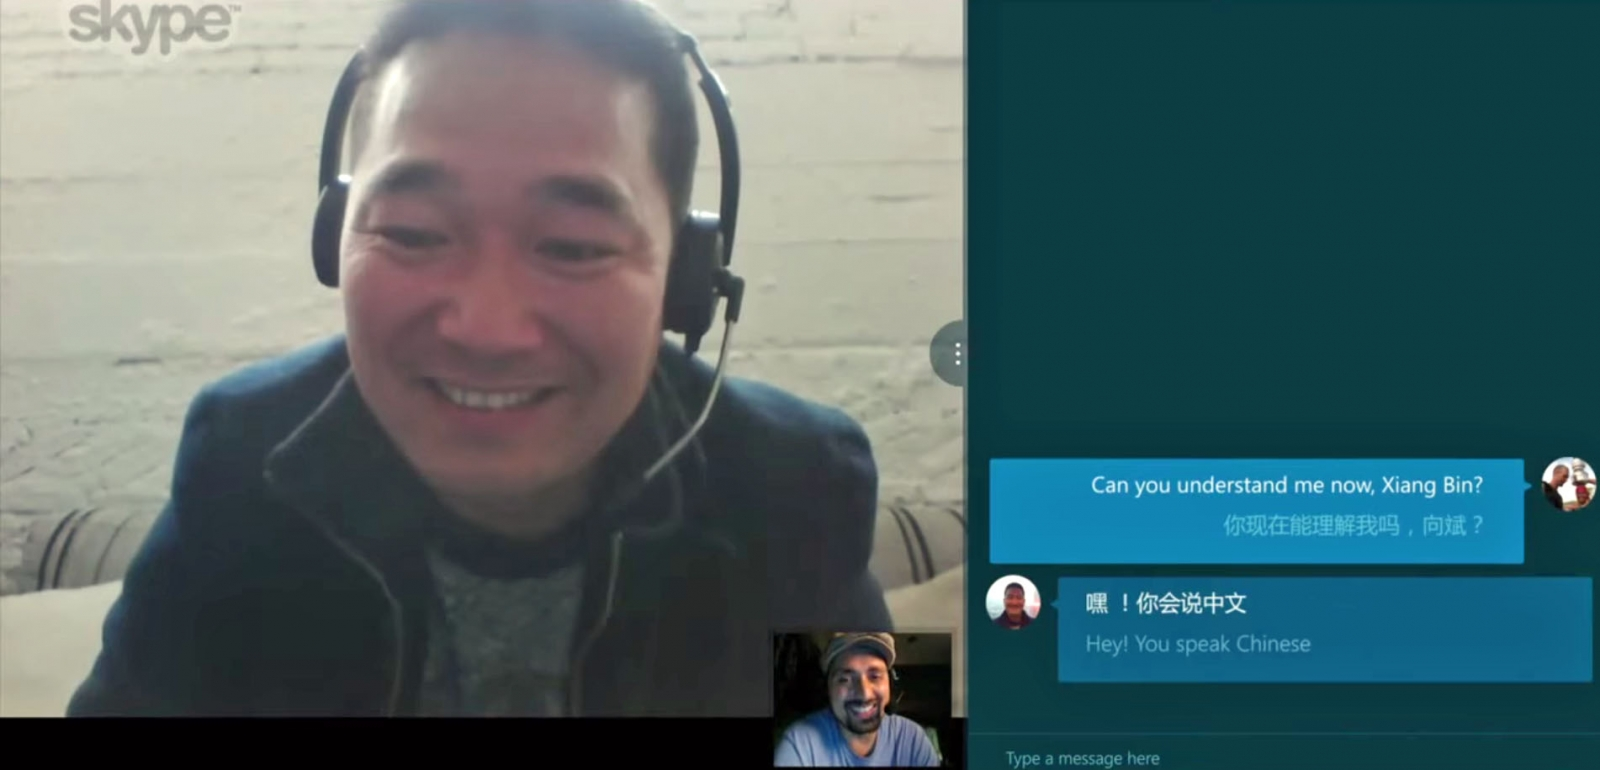 Skype Translator swears in Chinese